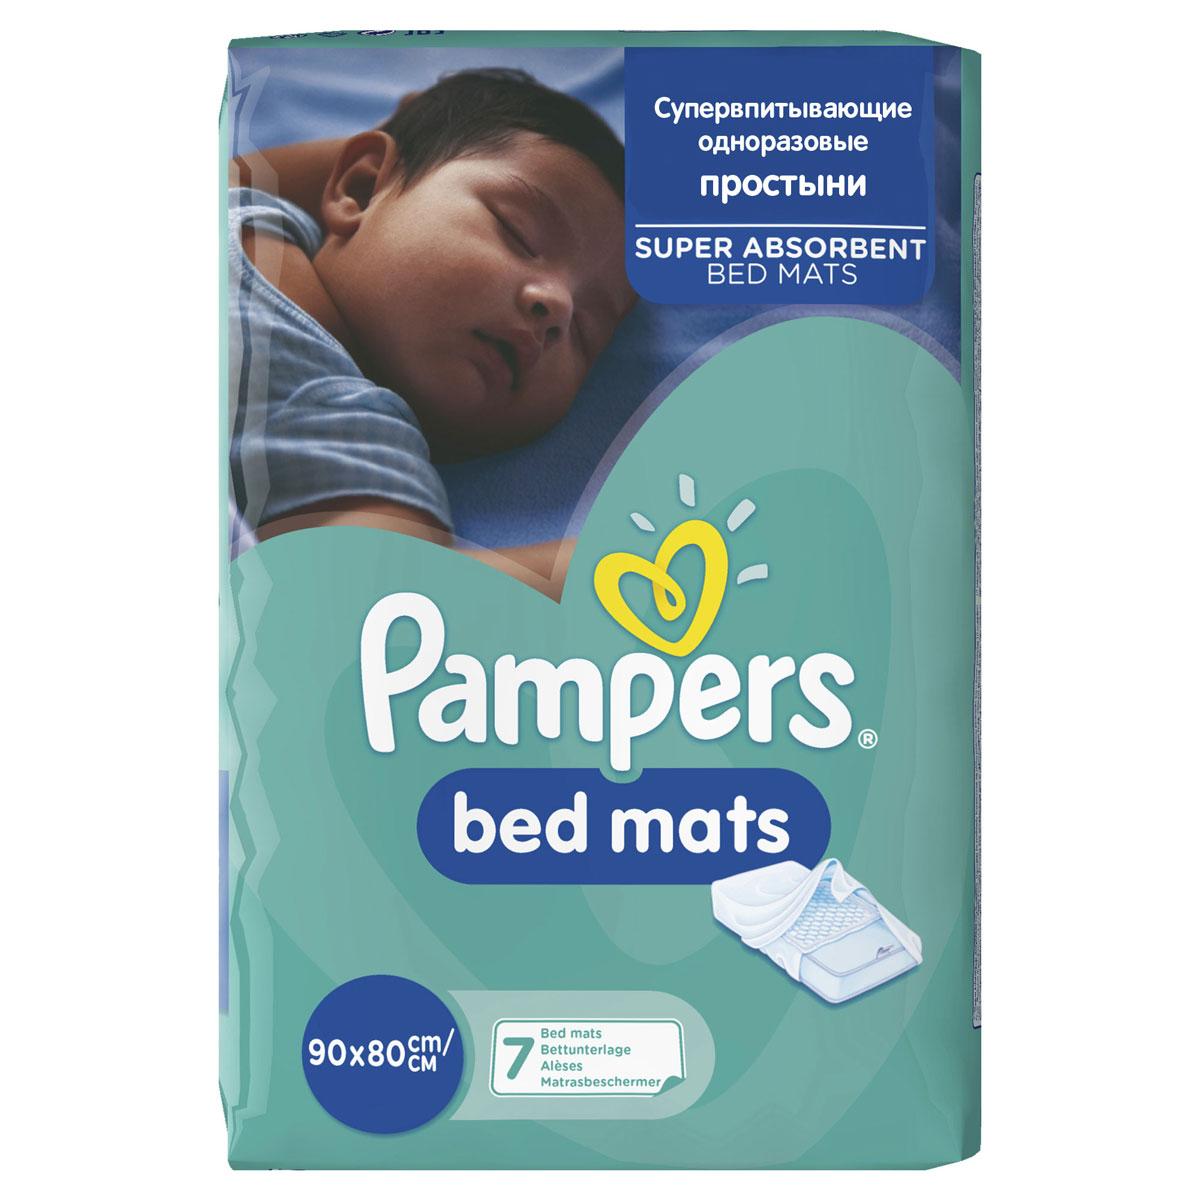 Pampers Простыня детская одноразовая BedMats 90 х 80 см 7 шт 4015400686101 pampers